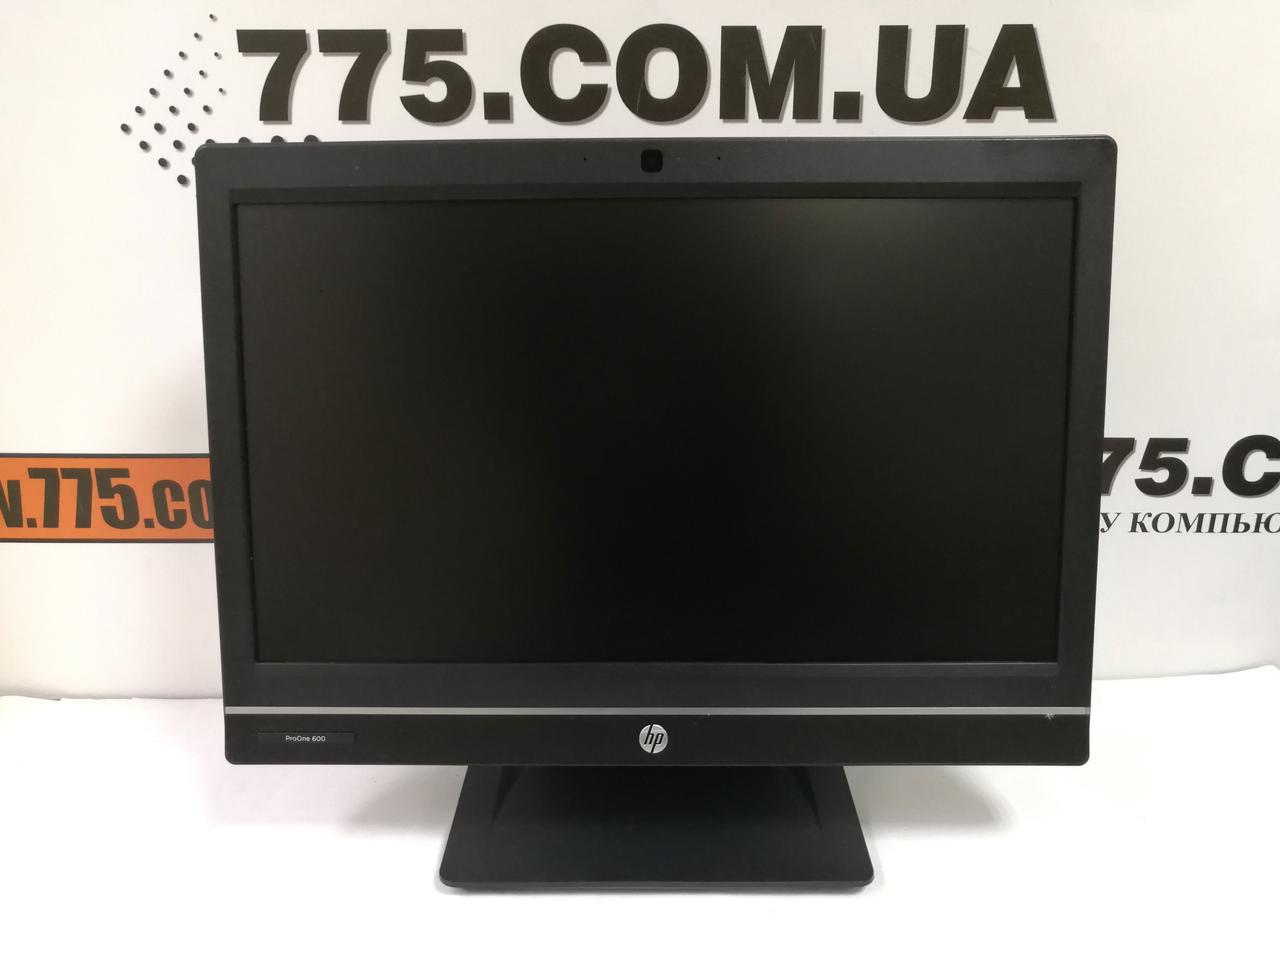 "Моноблок HP ProOne 600 21.5"" IPS (1920x1080), Intel Pentium G3220, 4ГБ DDR3, HDD 250ГБ"